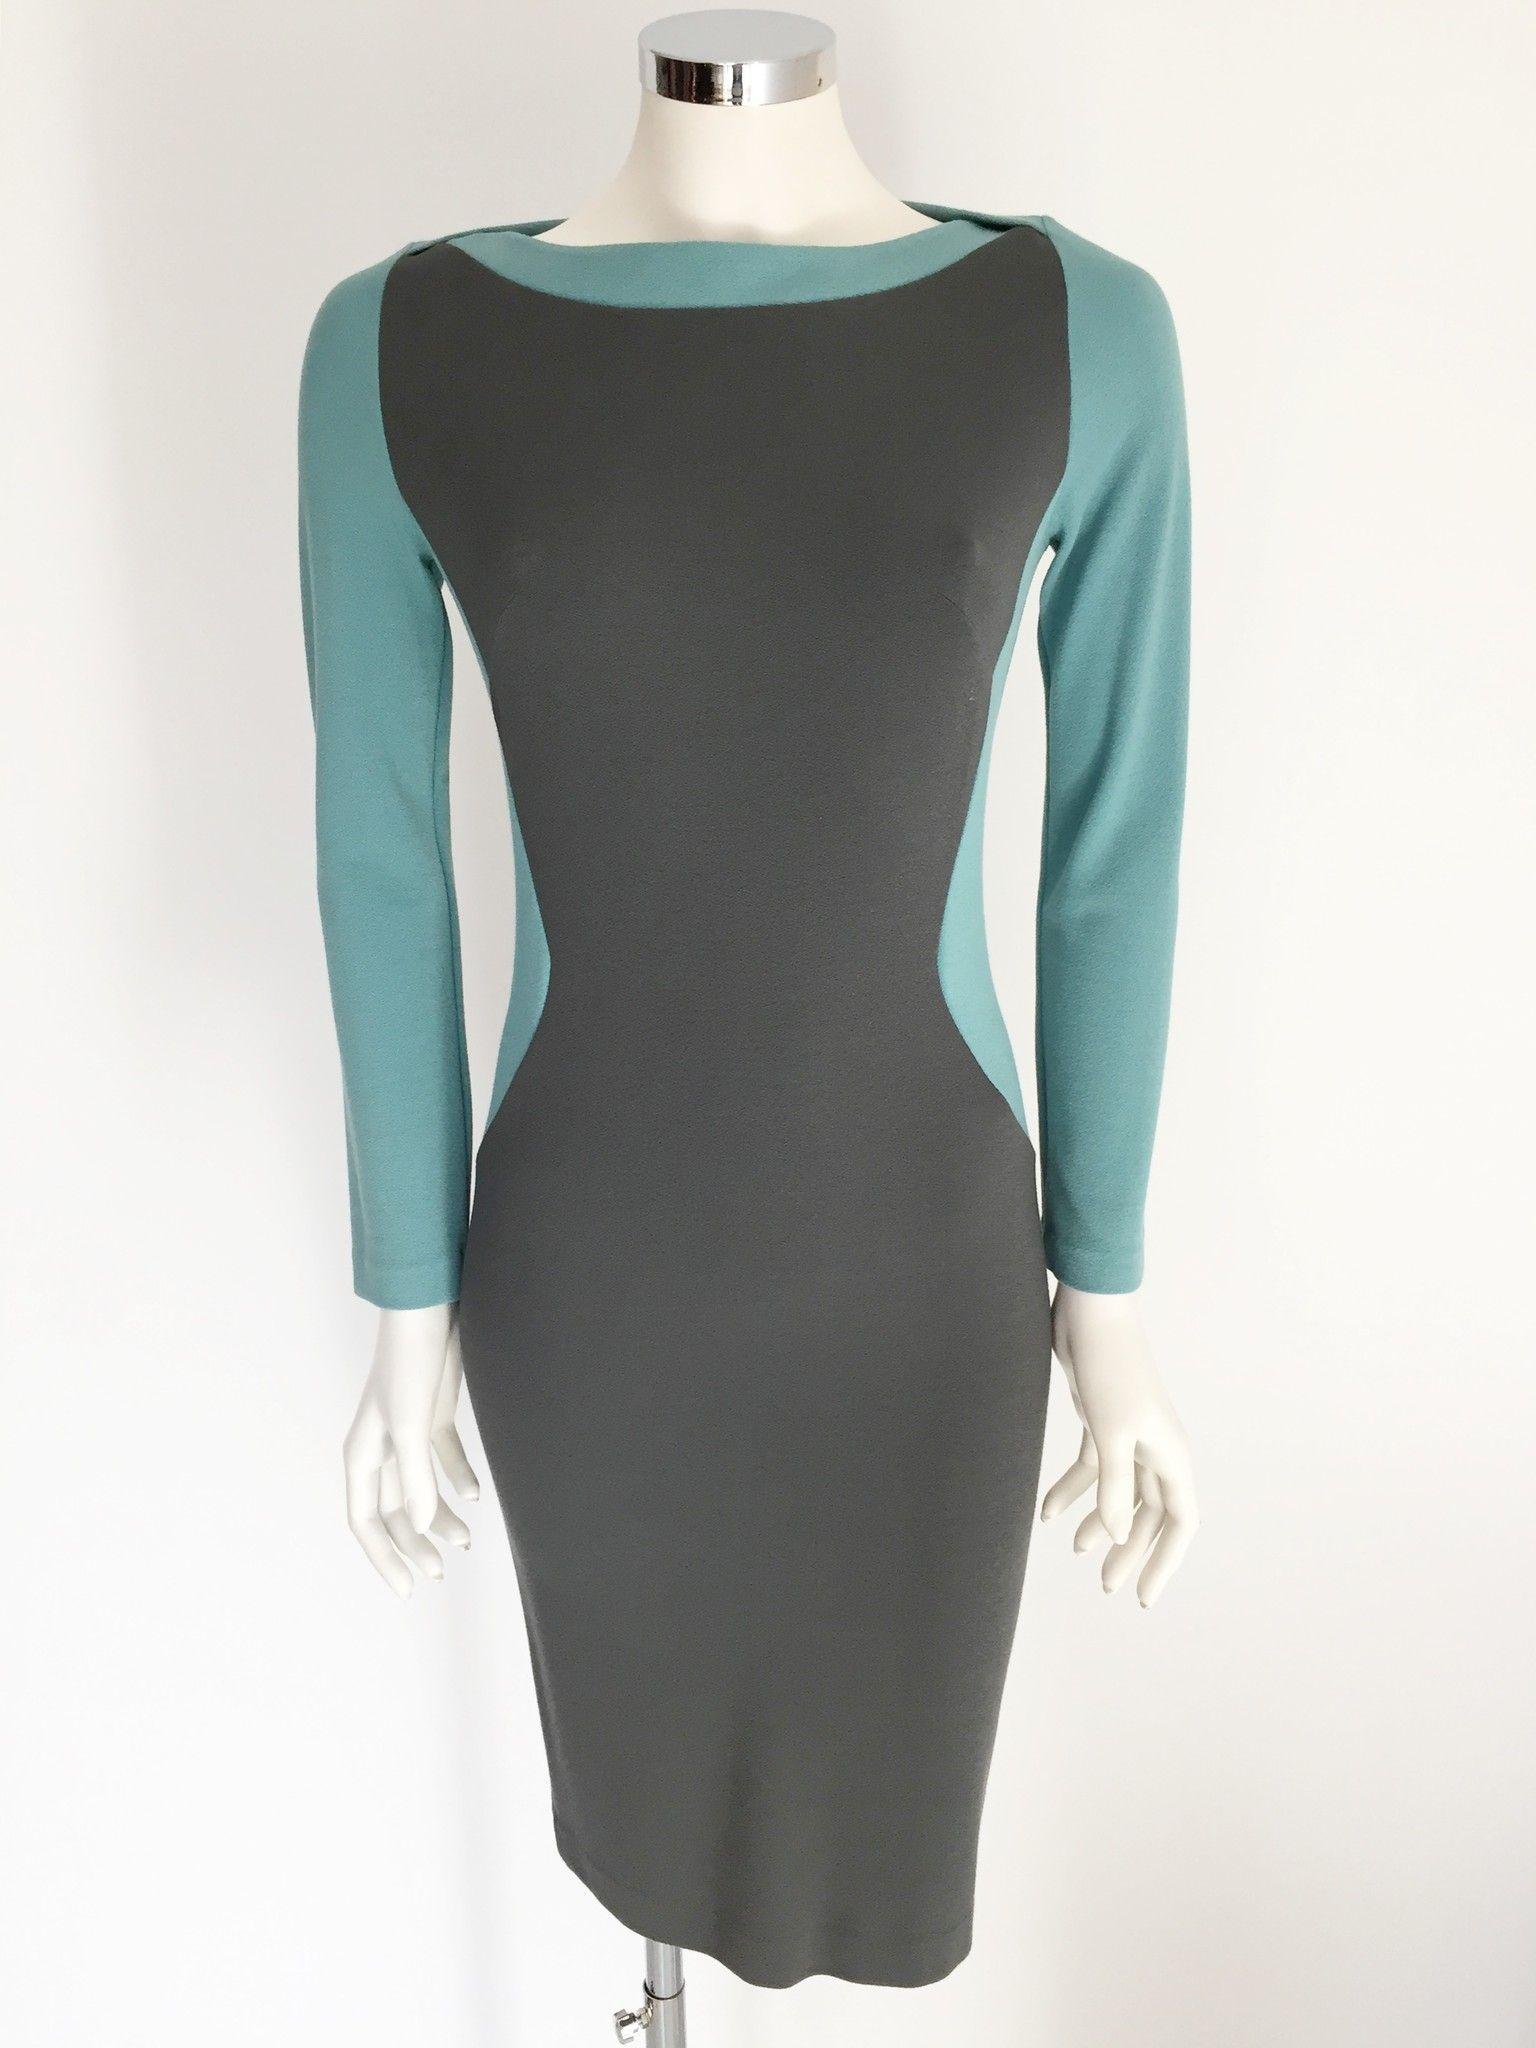 Adele Fado Long sleeve dress Cod.67575